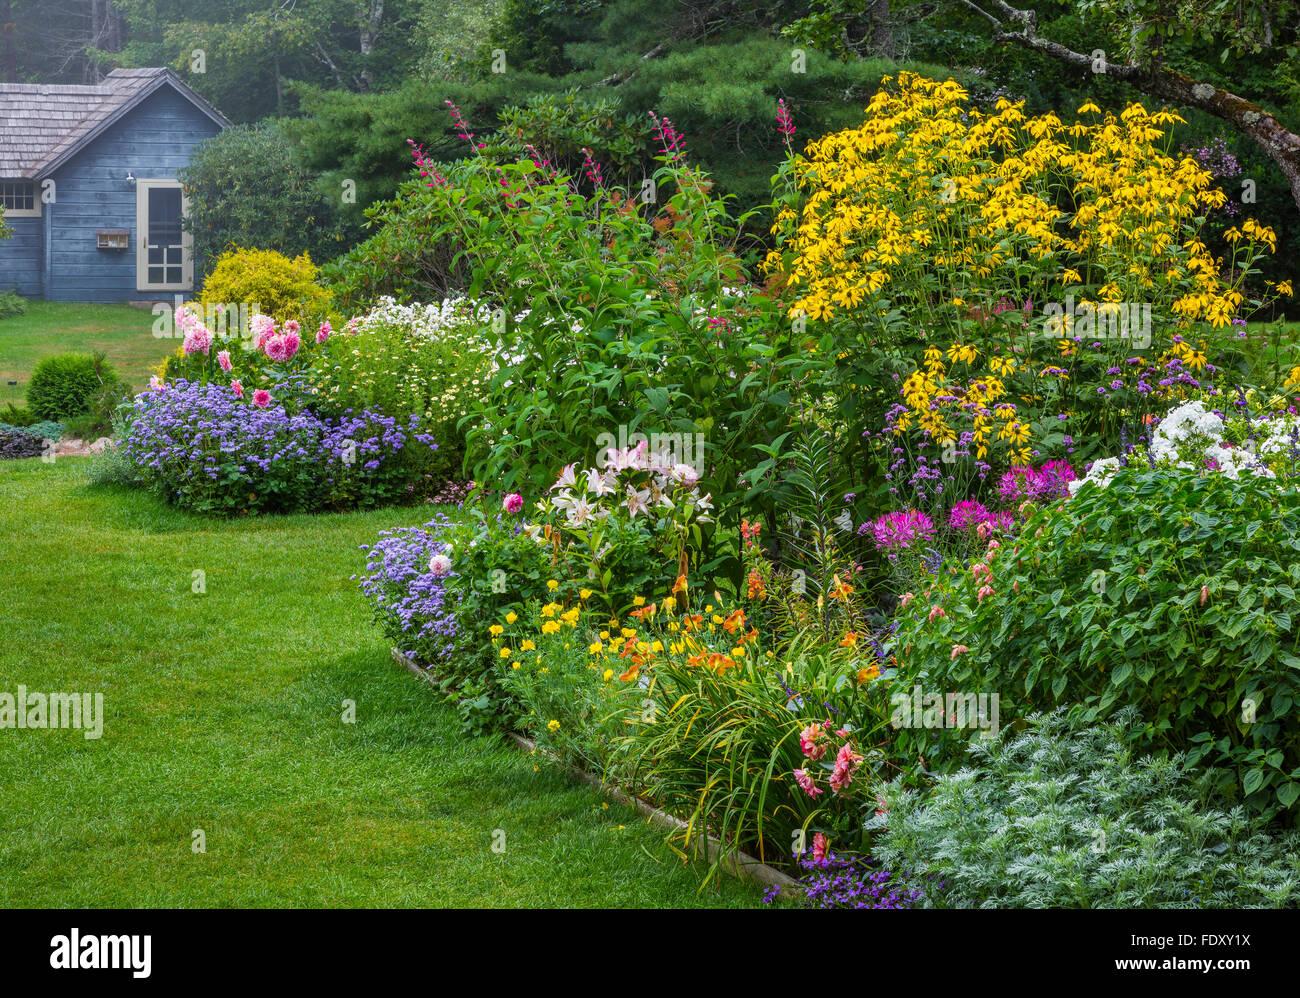 Northeast Harbor, Maine: Thuya Garden in summer. Featuring artemisia, lilies, rudbeckia, dahlias and salvia - Stock Image